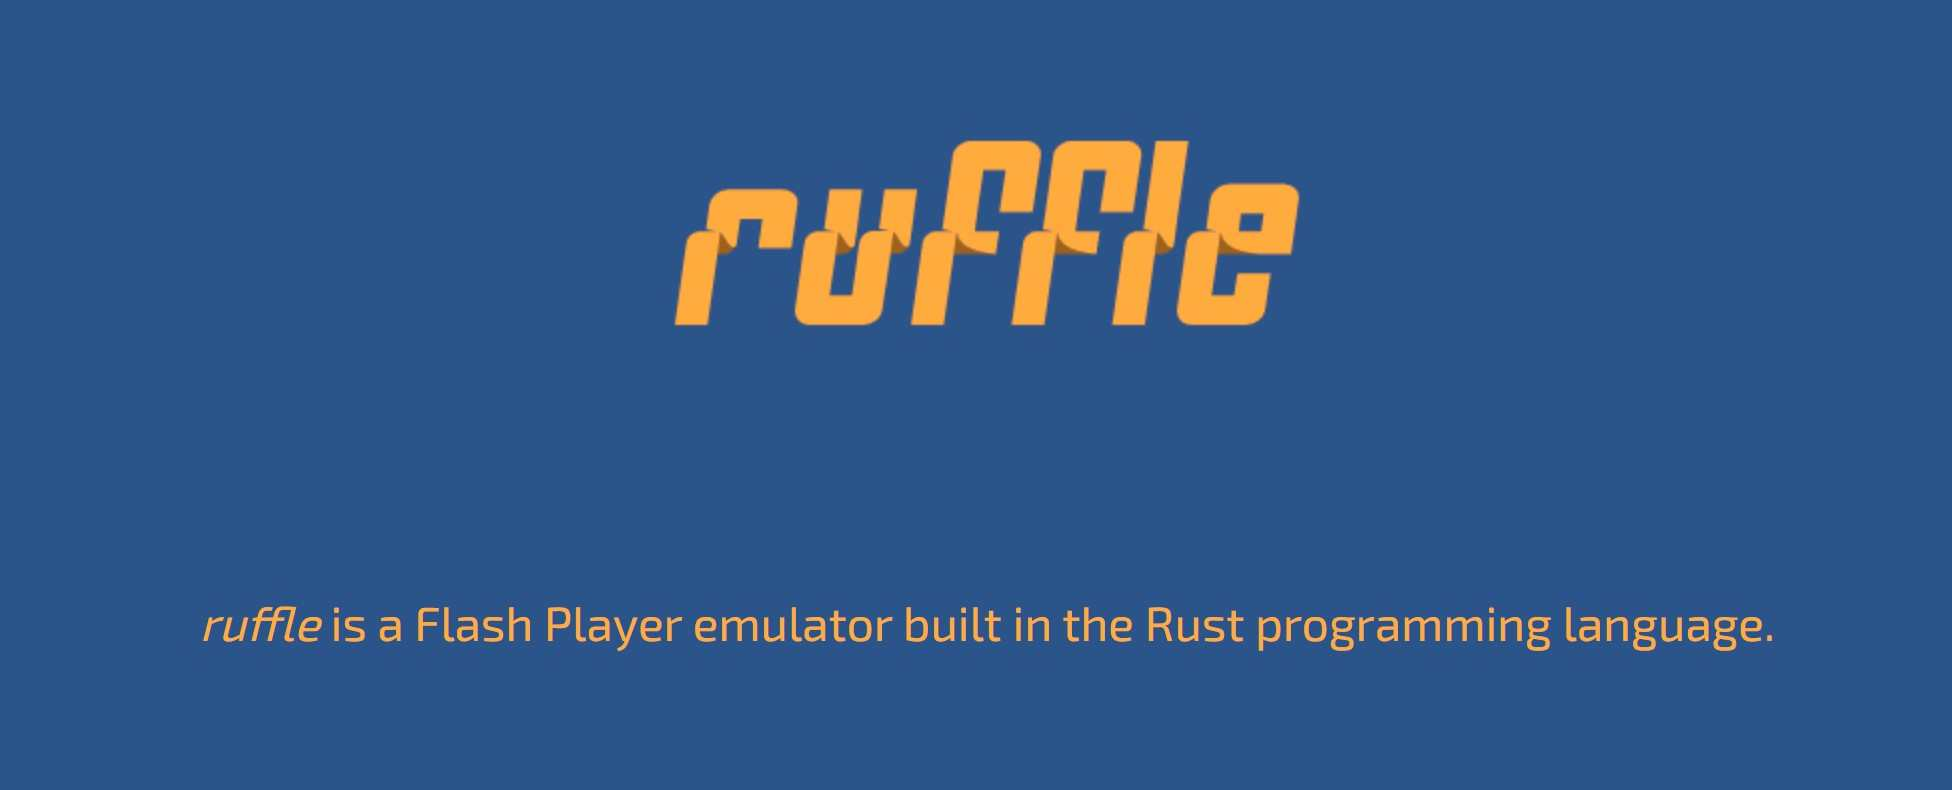 Ruffle Adobe Flash Player emulator for PC – Download ZIP